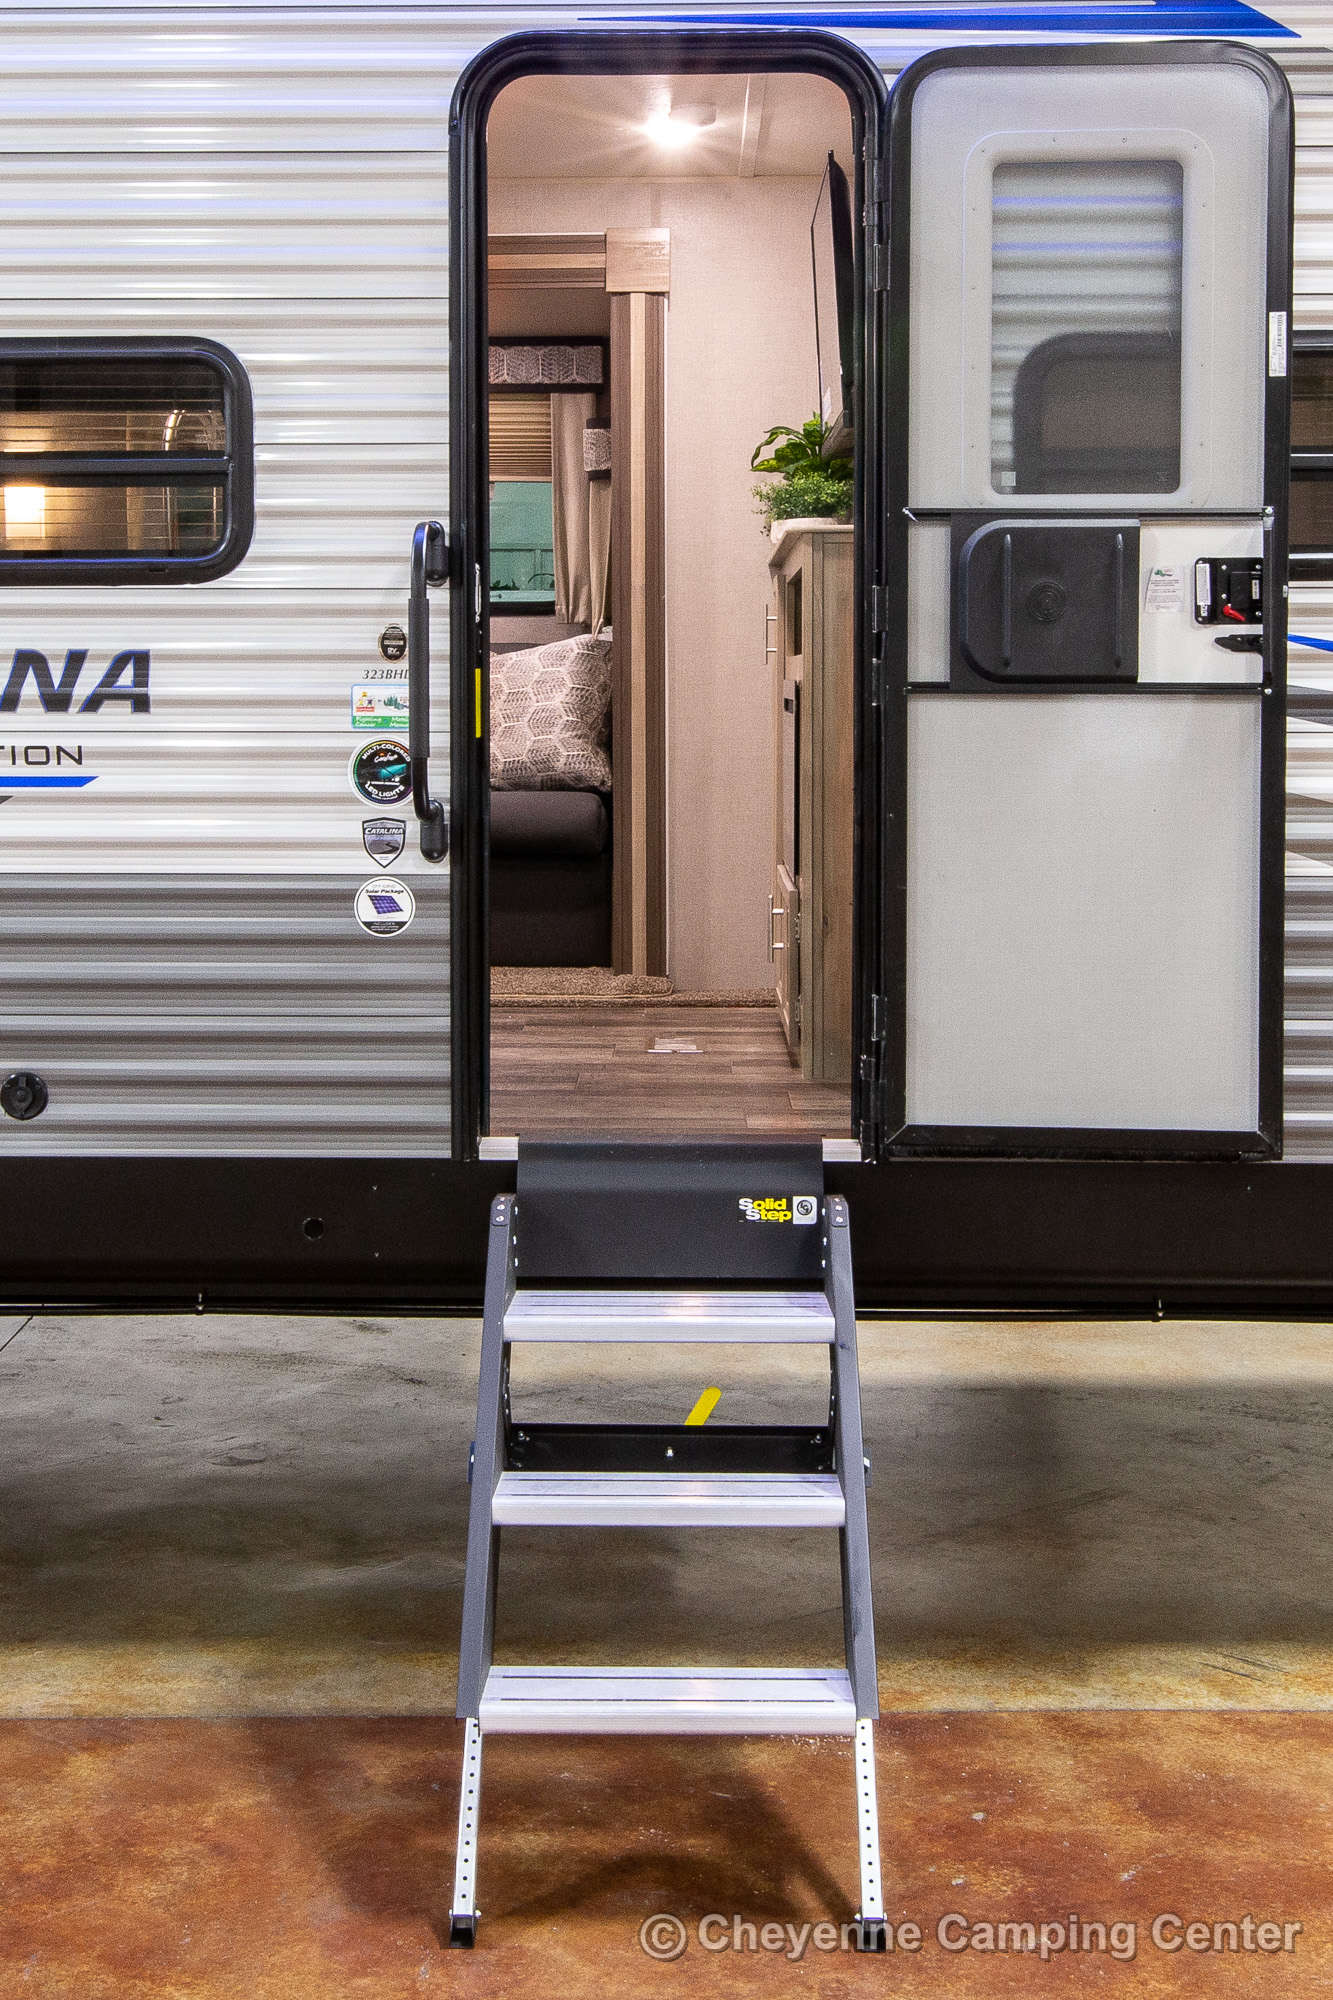 2022 Coachmen Catalina Legacy Edition 323BHDSCK Bunkhouse Travel Trailer Exterior Image